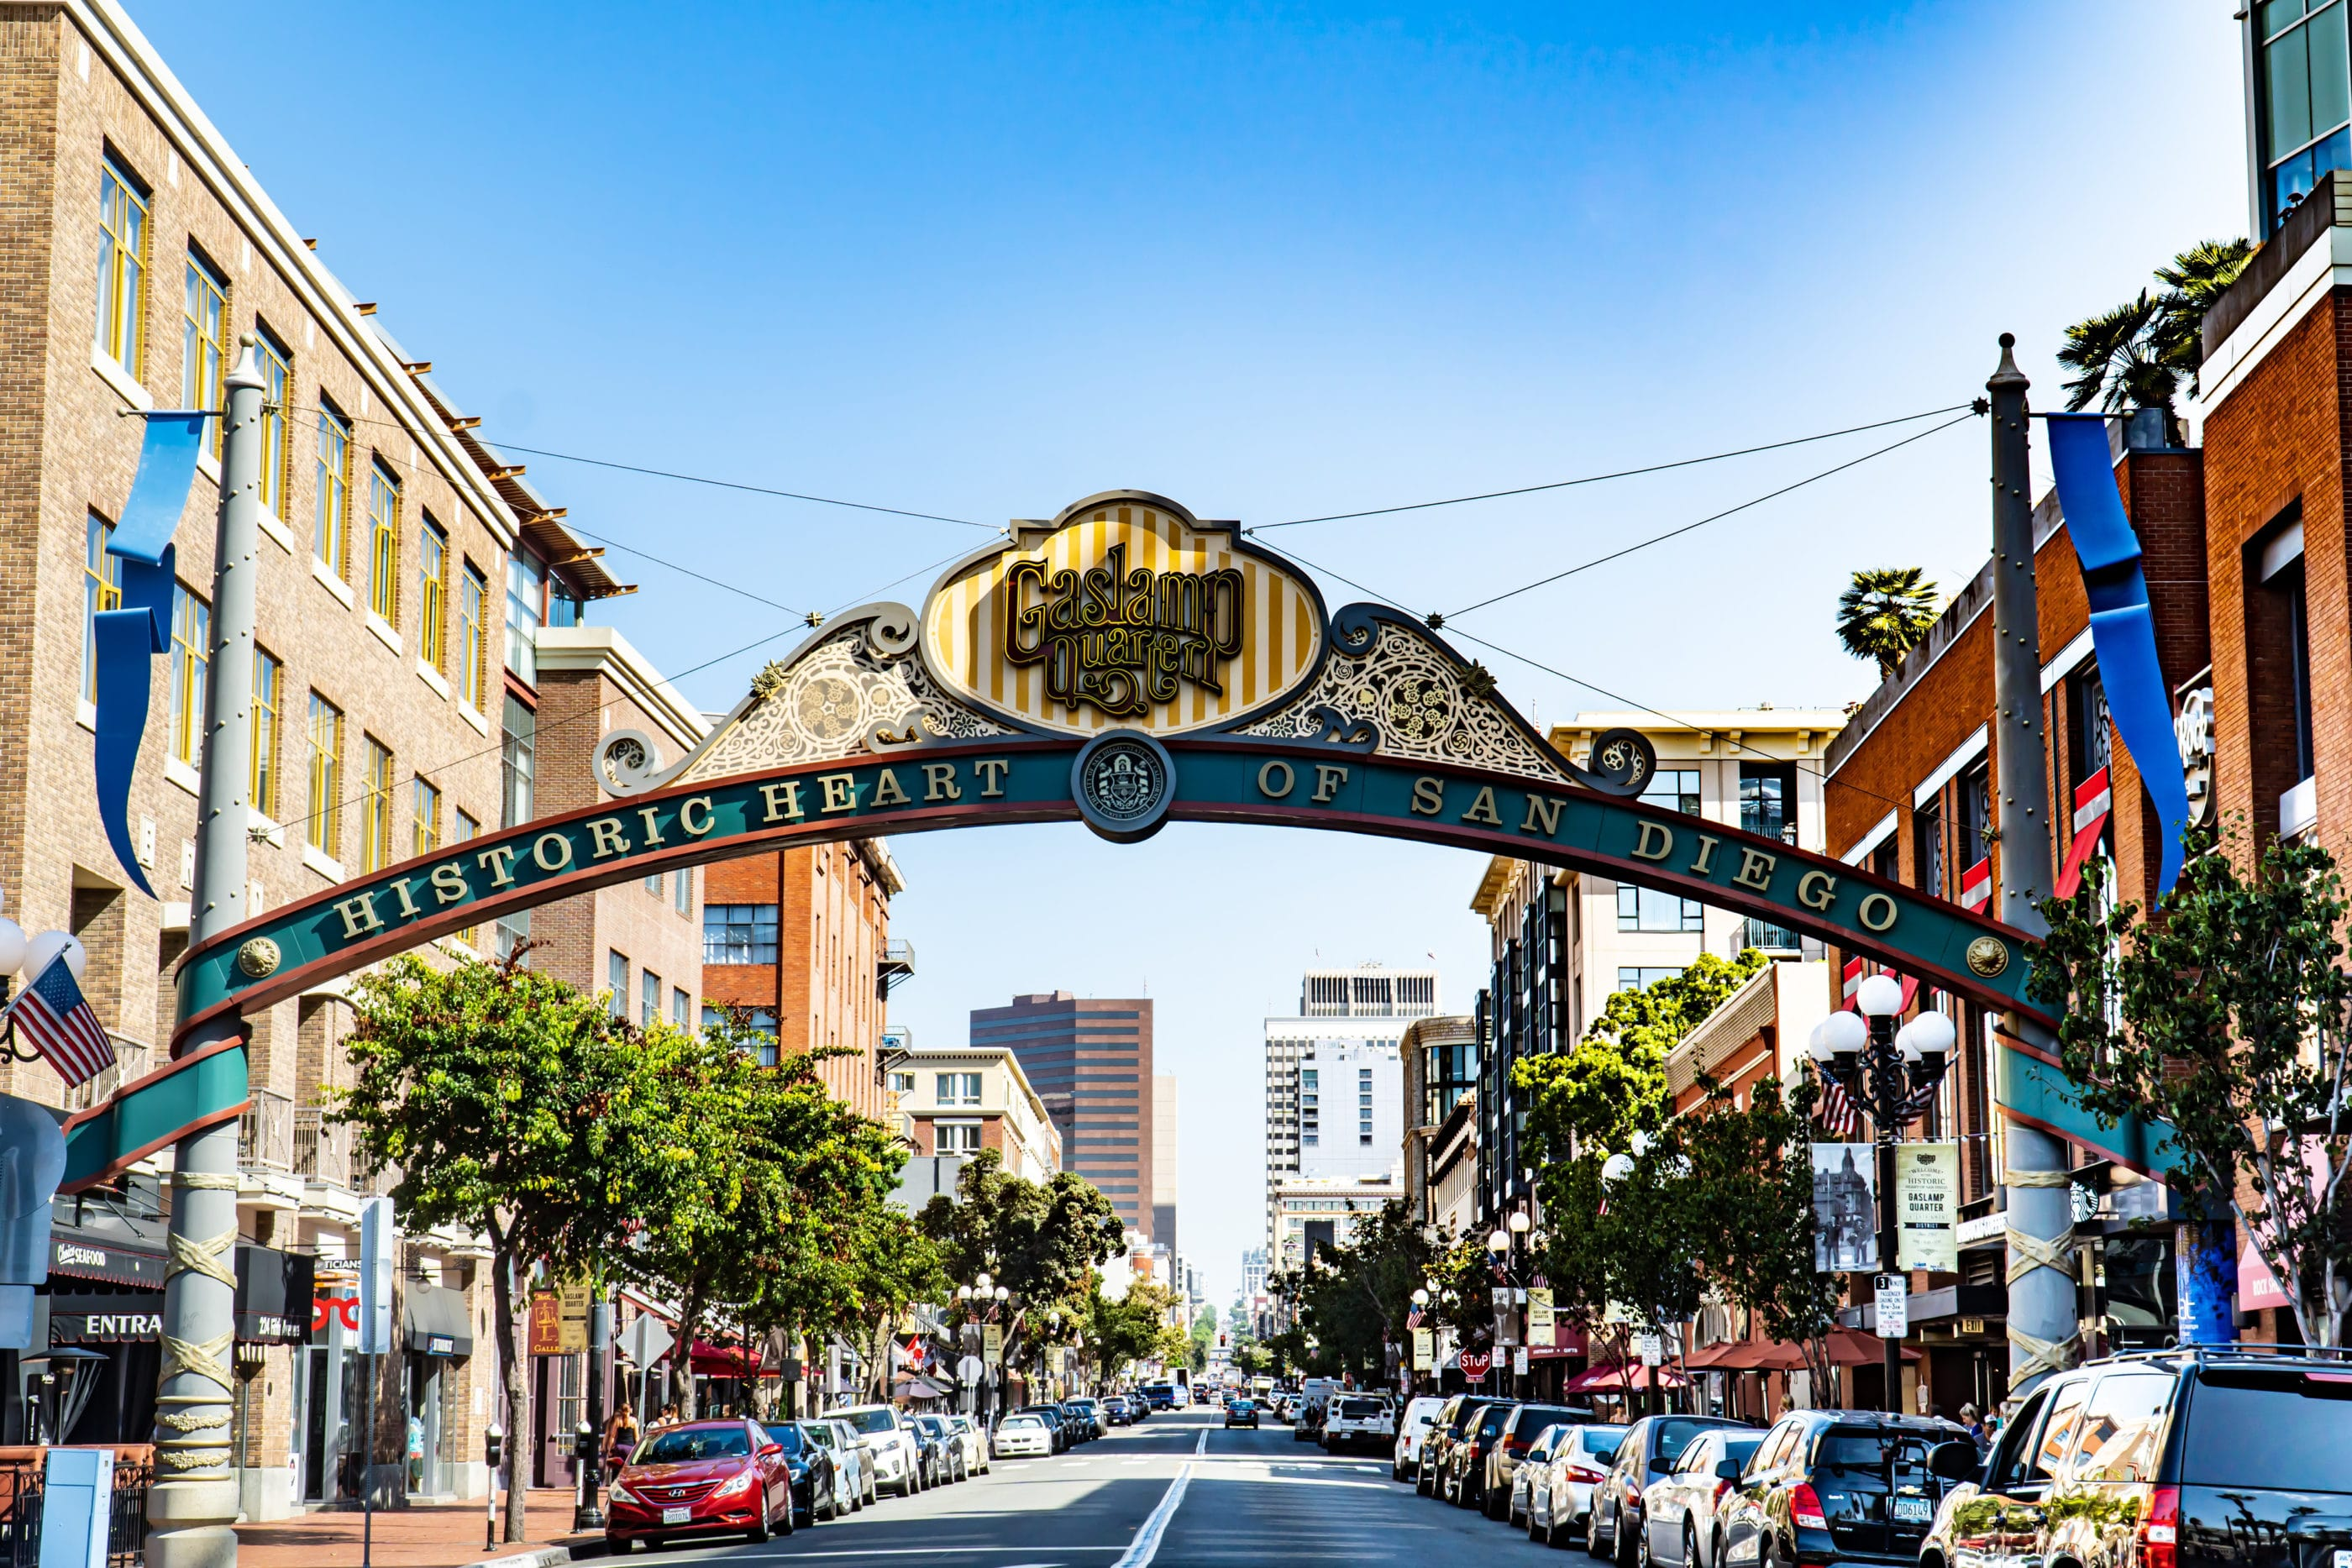 The San Diego Gaslamp Quarter Sign